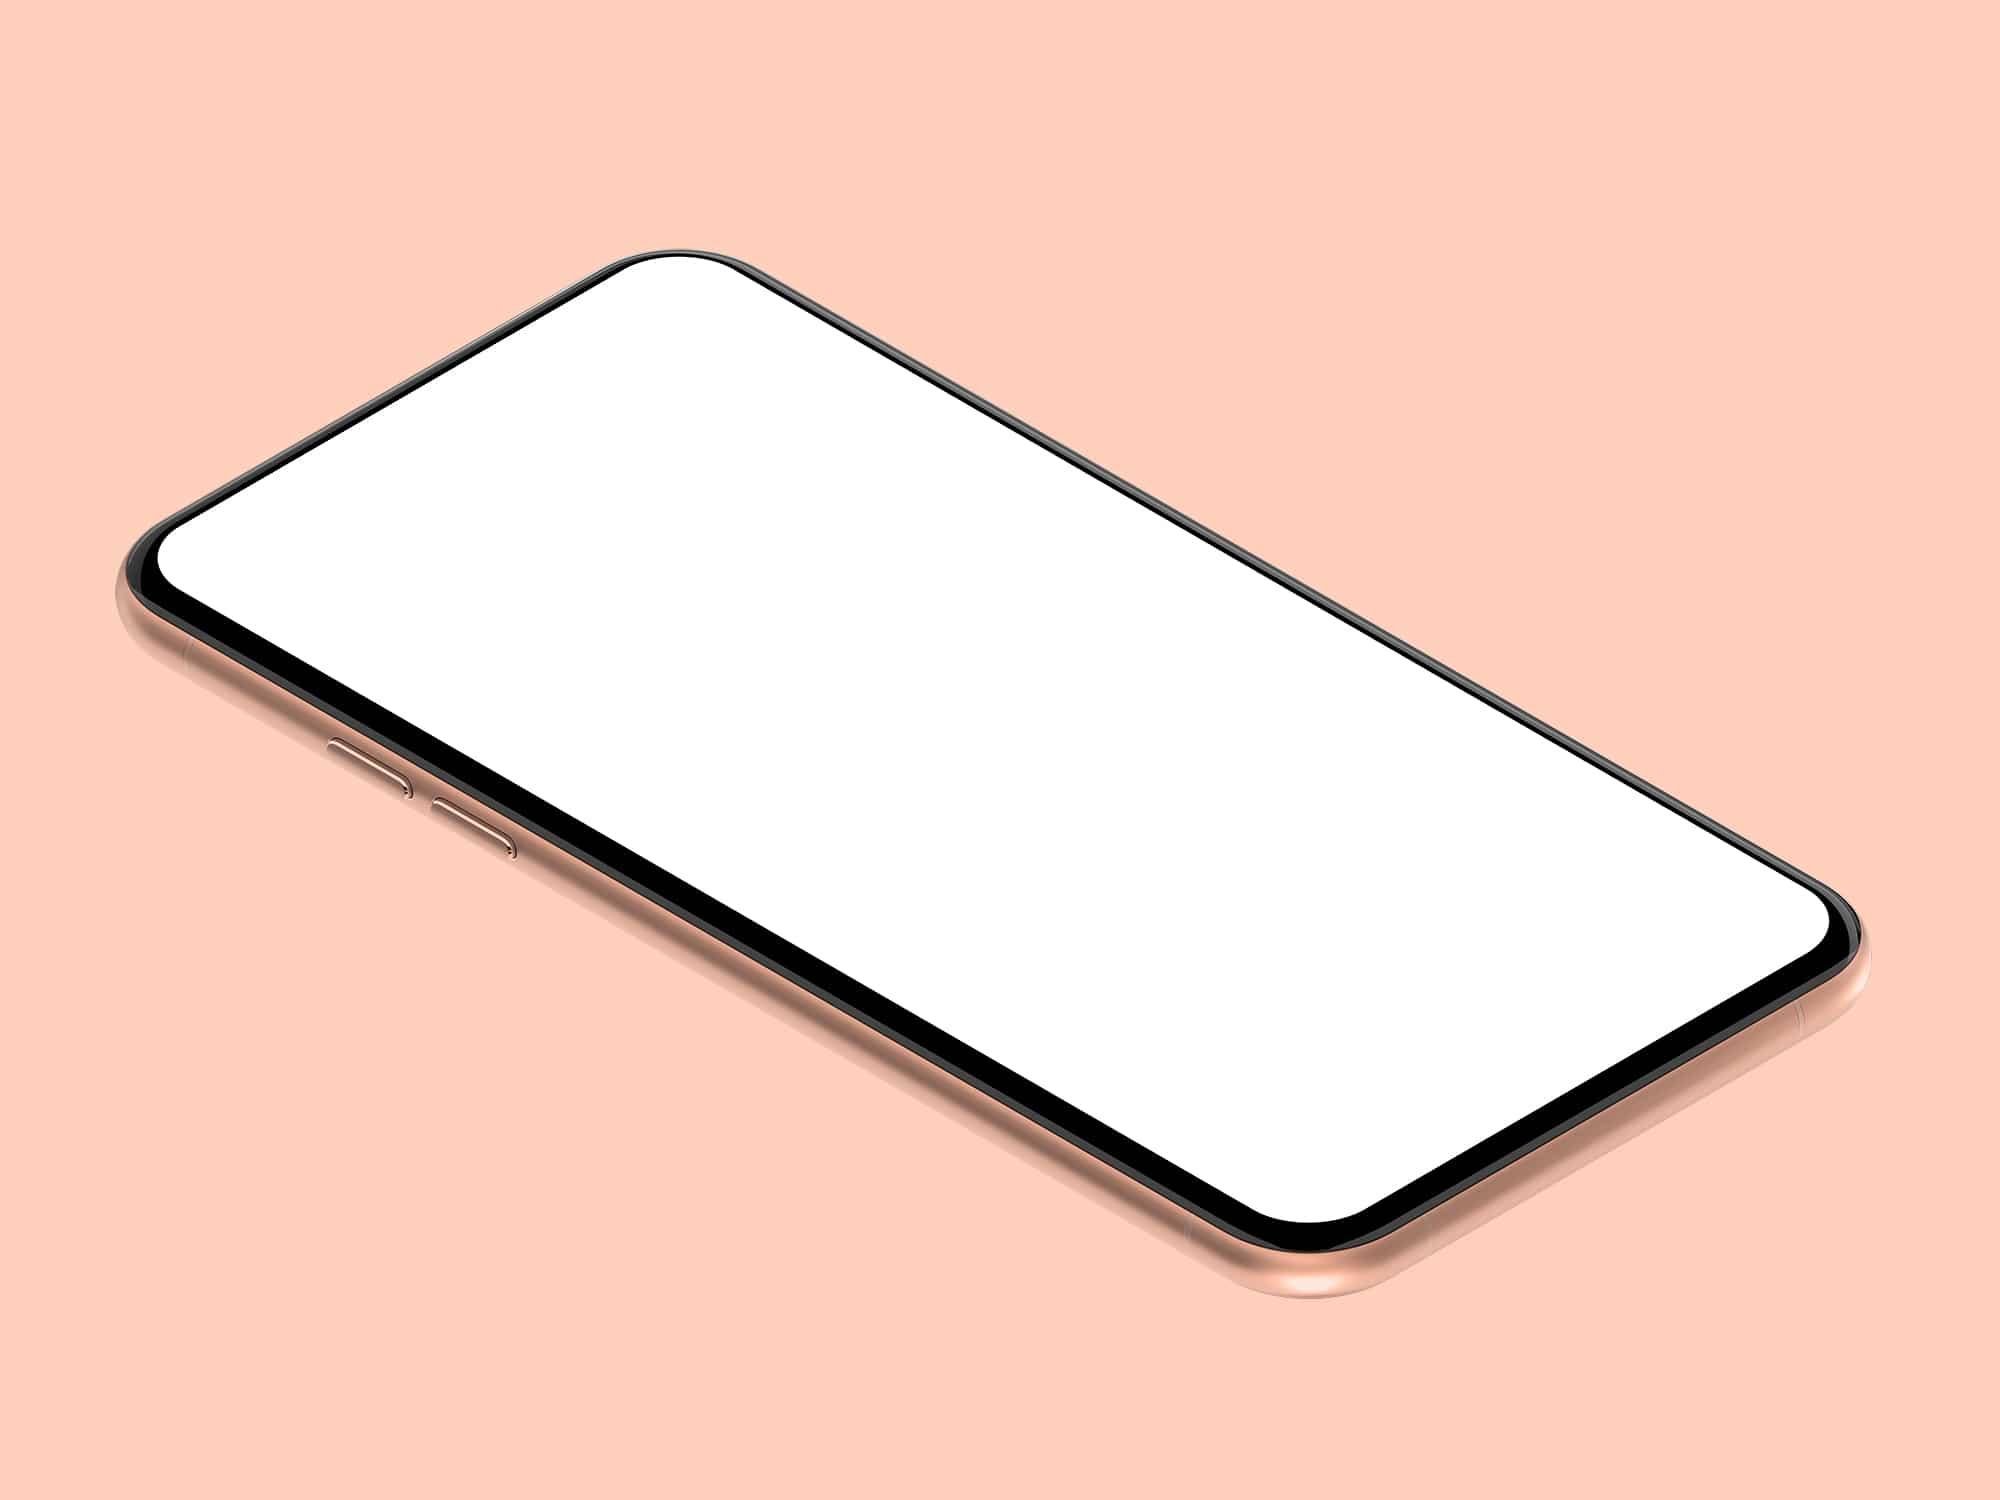 Generic Mobile Device Mockup | The Mockup Club